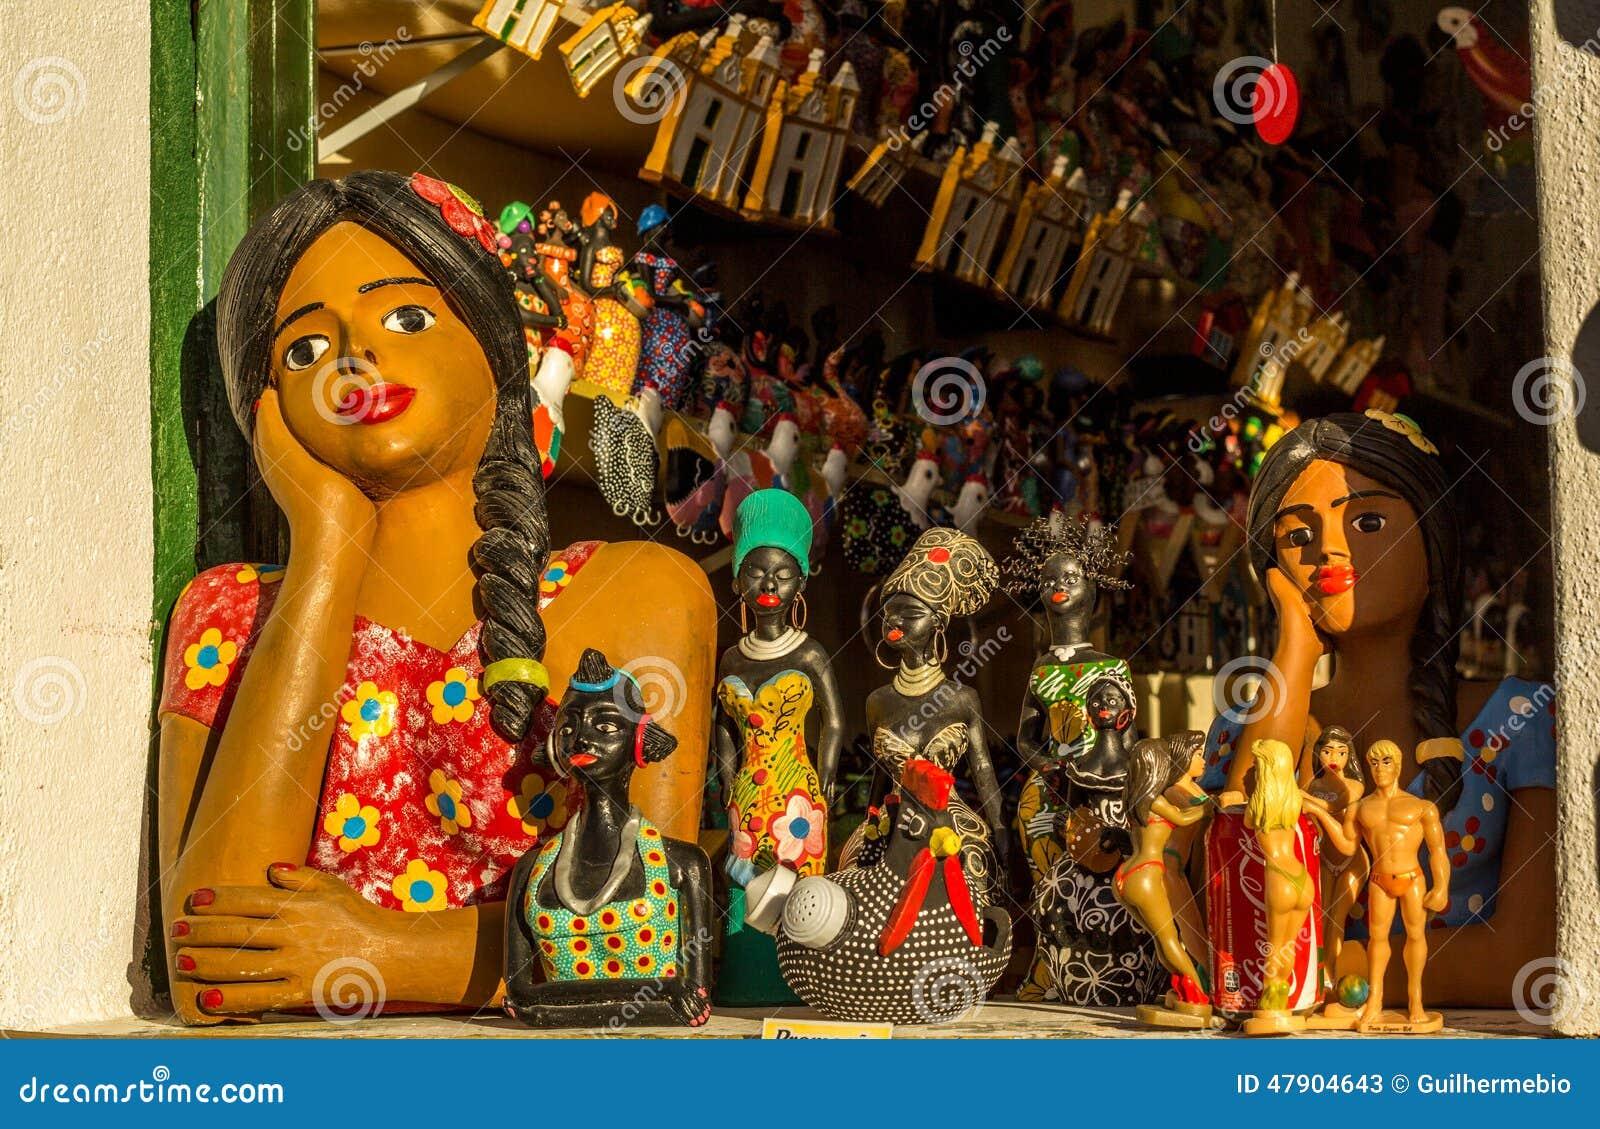 Handicraft from Bahia, Brazil